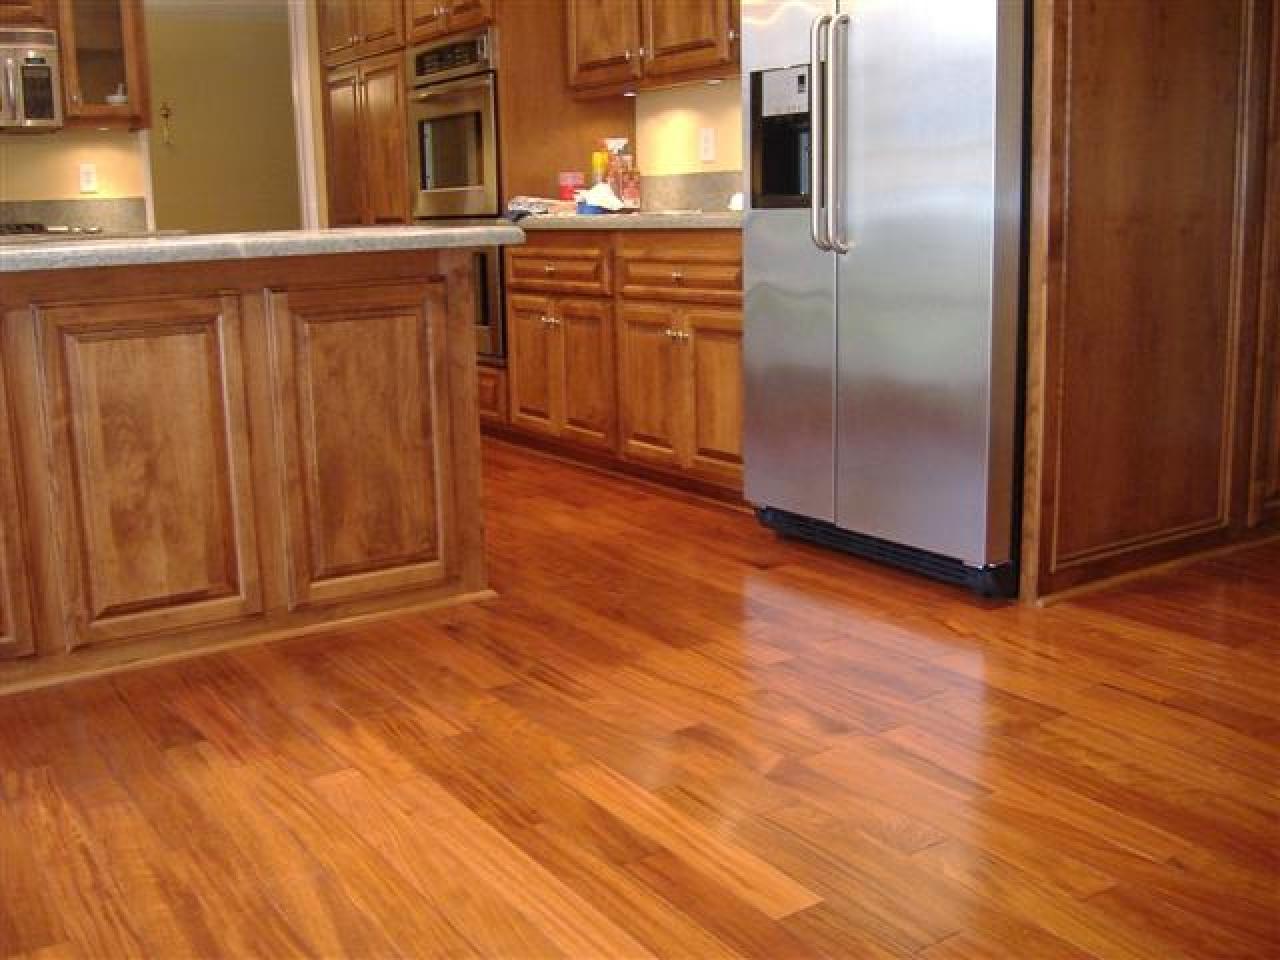 laminate wood flooring for kitchen photo - 9